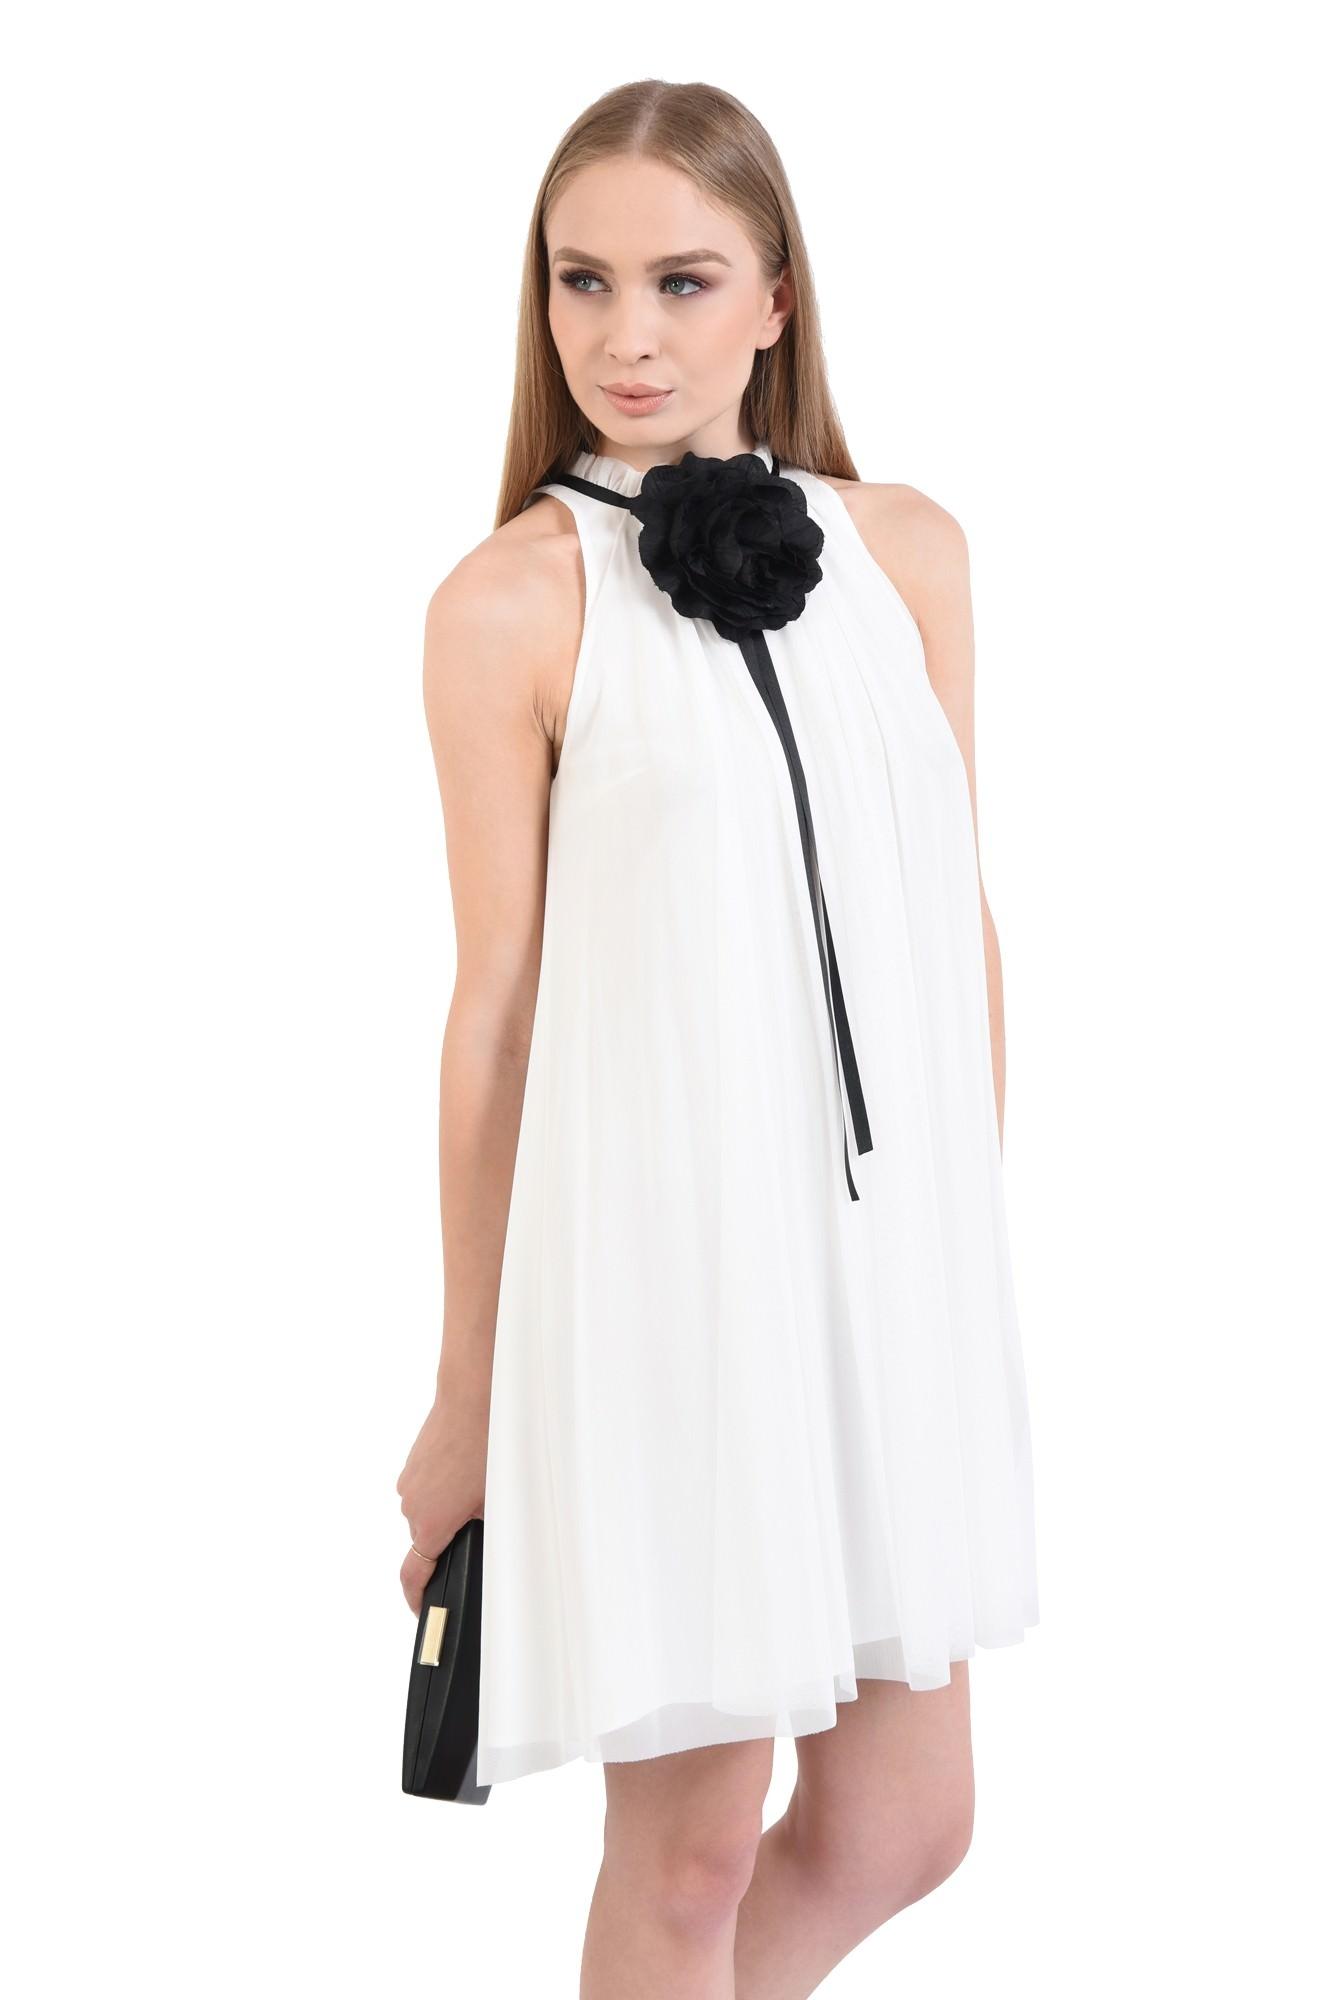 0 - rochii online, croi lejer, floare textila, contrast, tulle